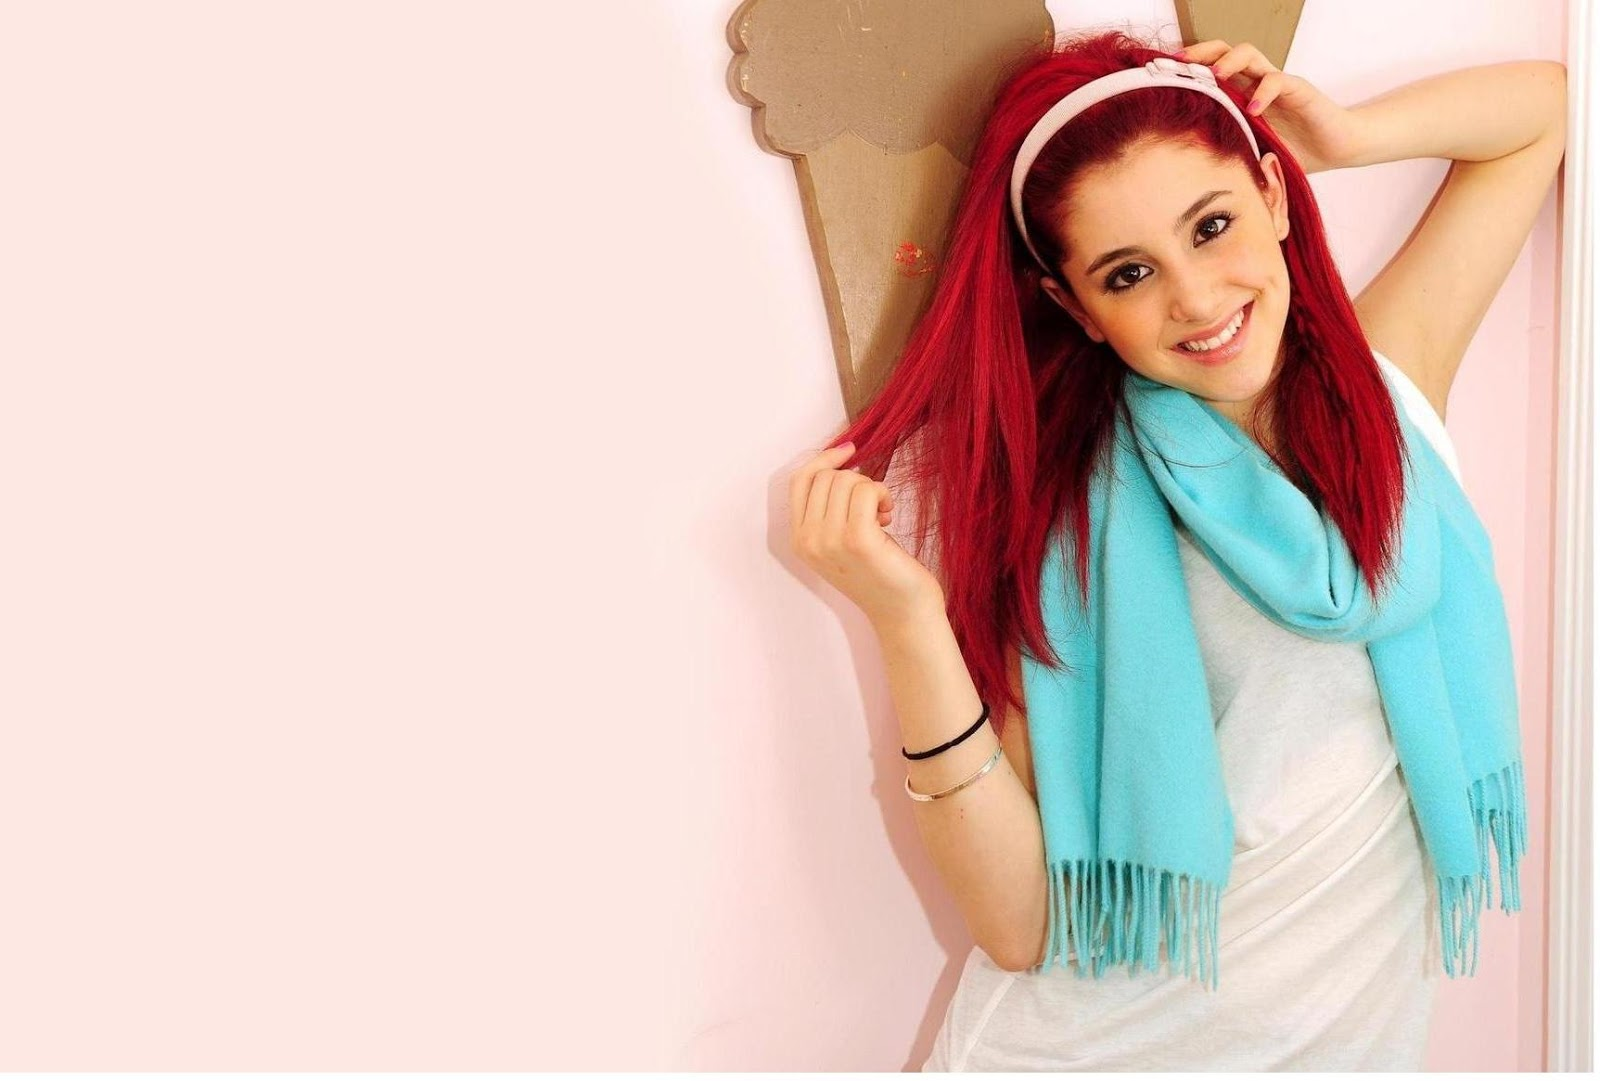 Ariana Grande Wallpapers Free Download